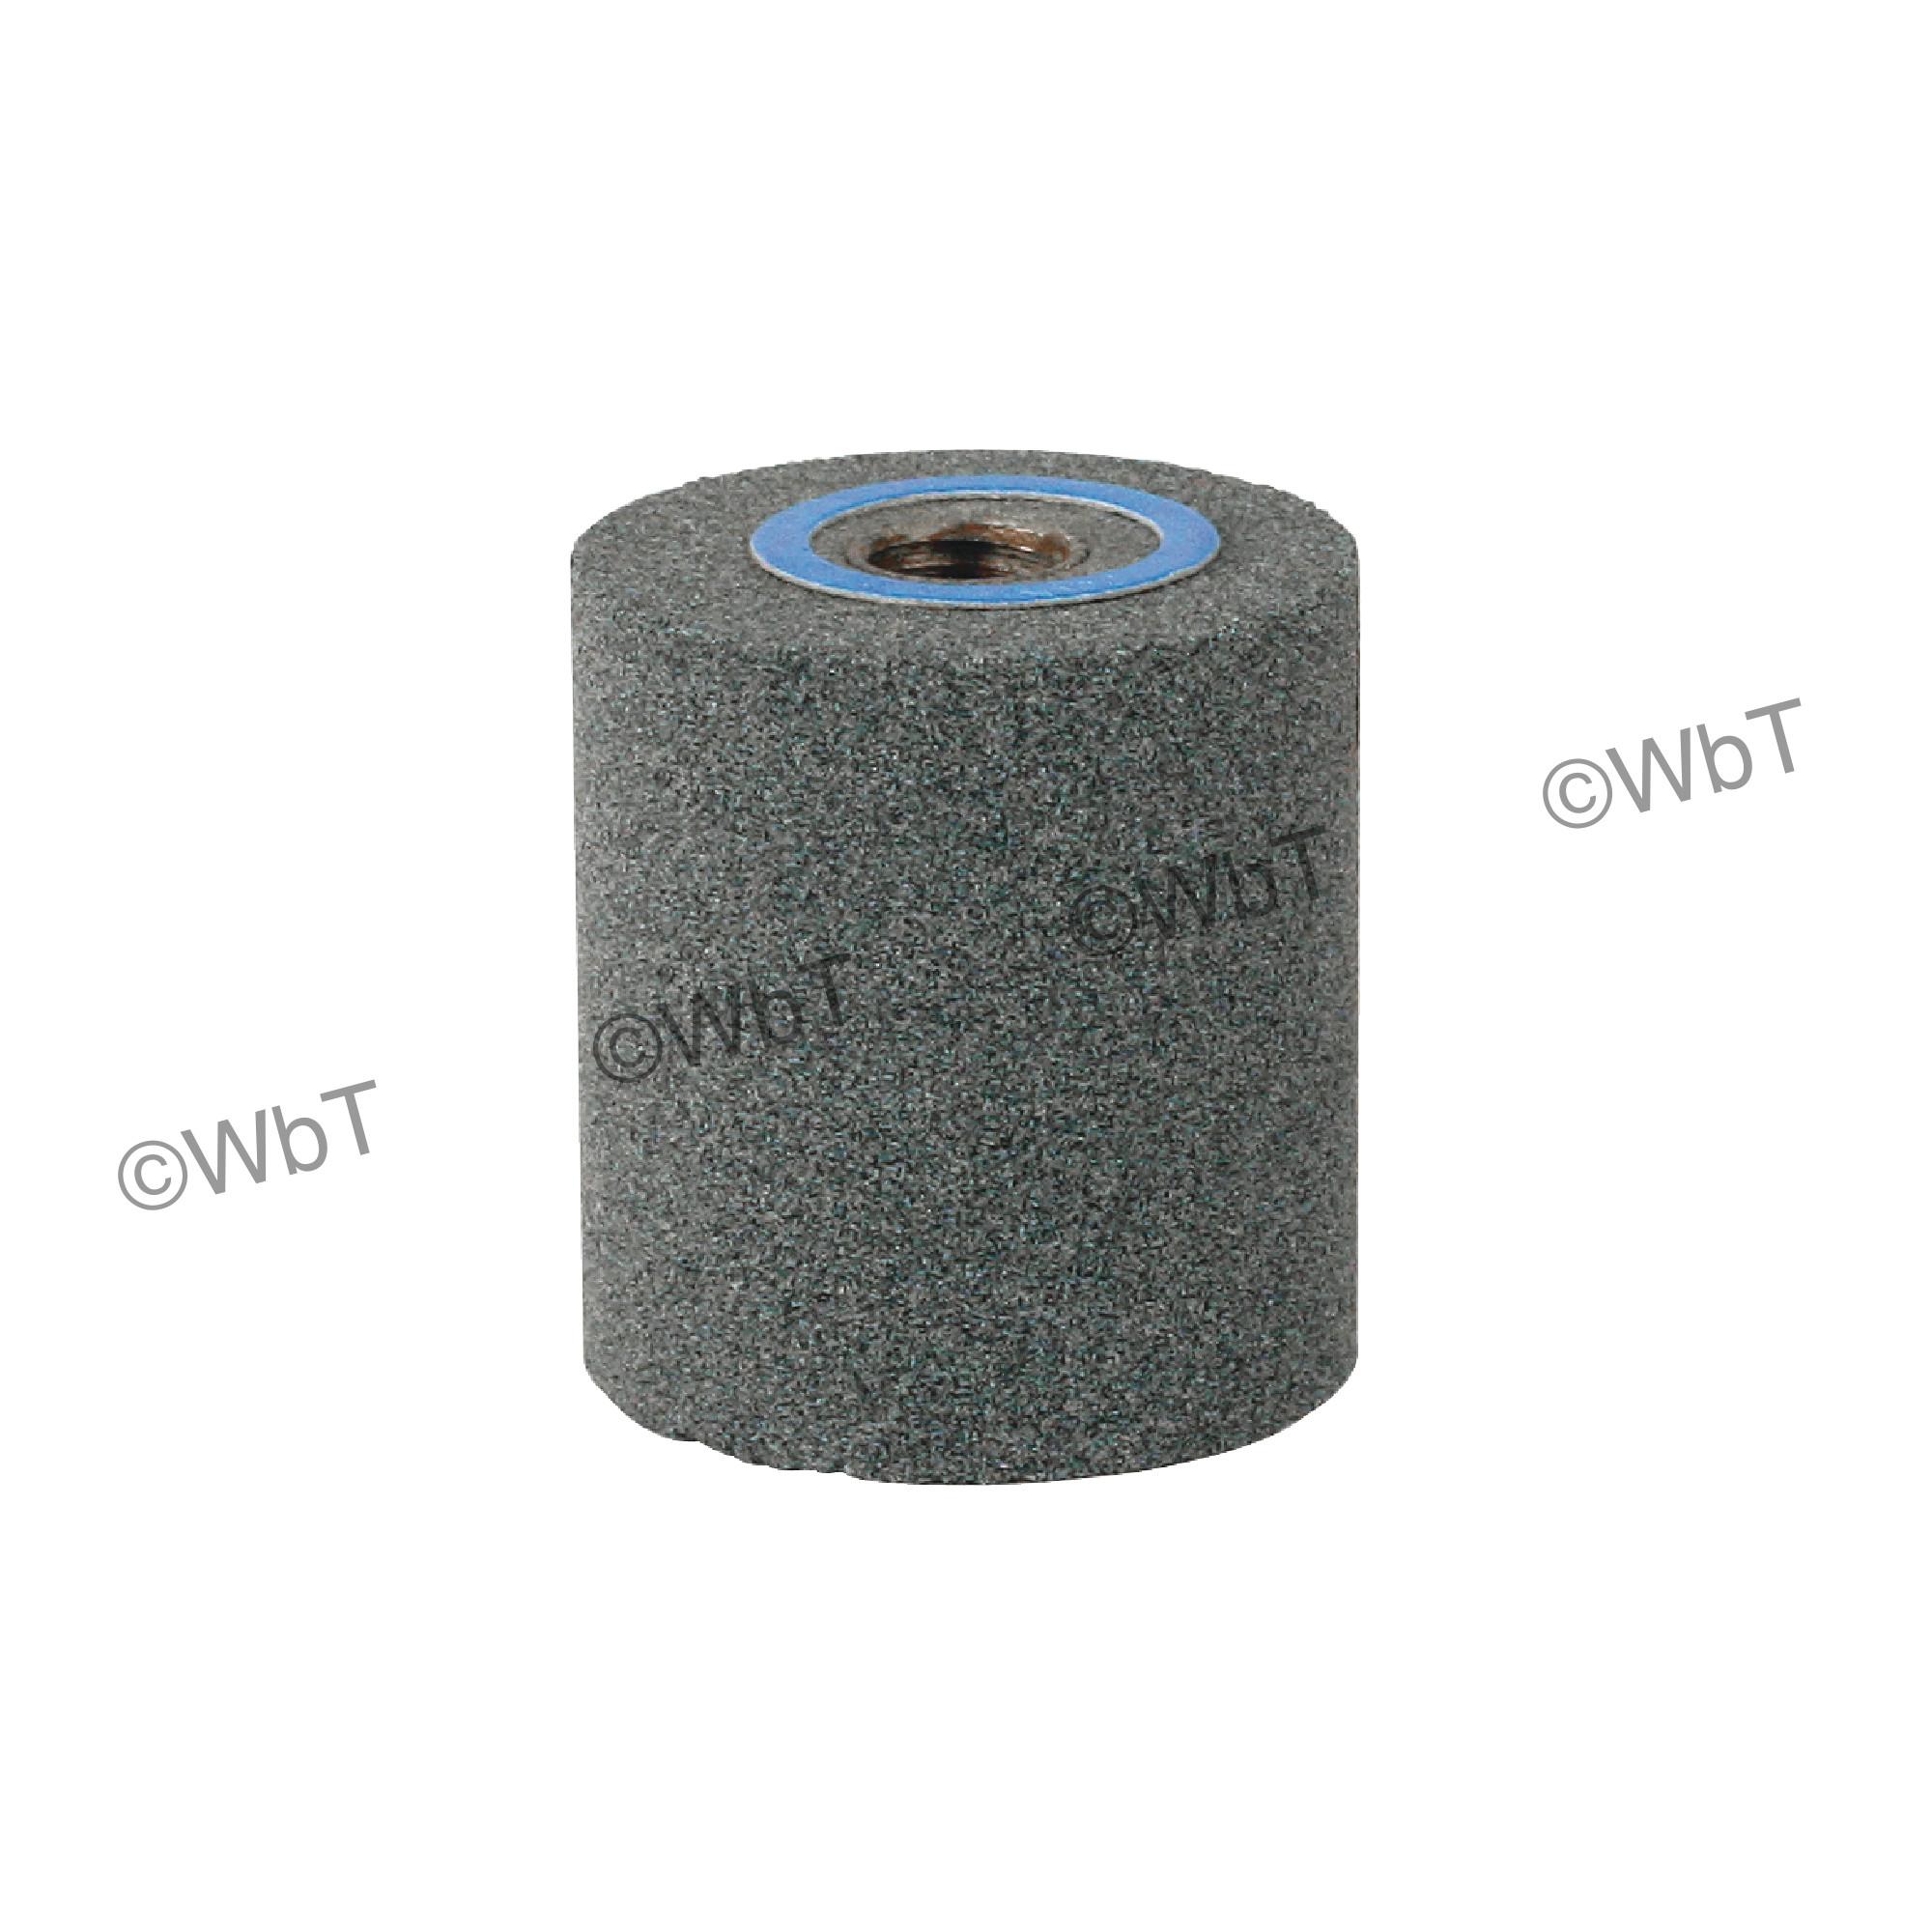 TDR/SRD Drill Grinder Optional Accessories